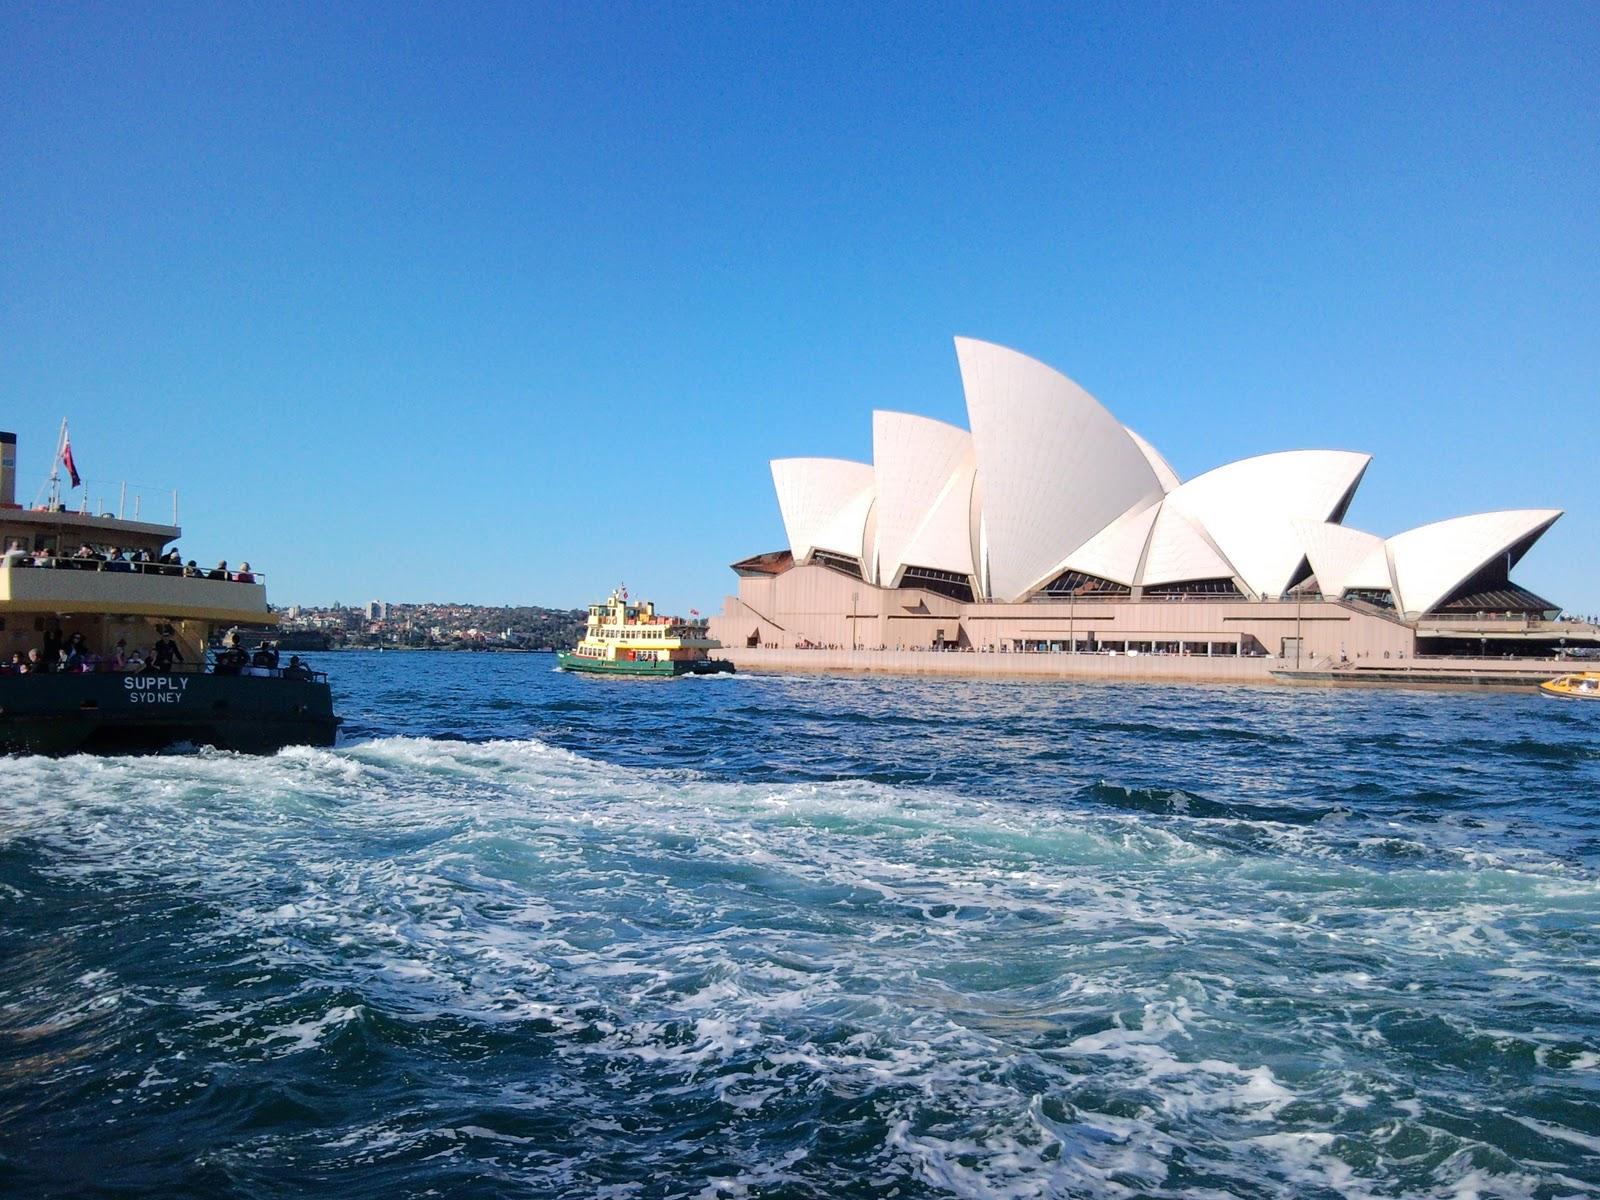 http://3.bp.blogspot.com/-jRwMpF0ggew/TrOLKVu0tuI/AAAAAAAACrQ/HPIik-5K5rM/s1600/Sydney+Opera+House+hd+wallpaper.jpg